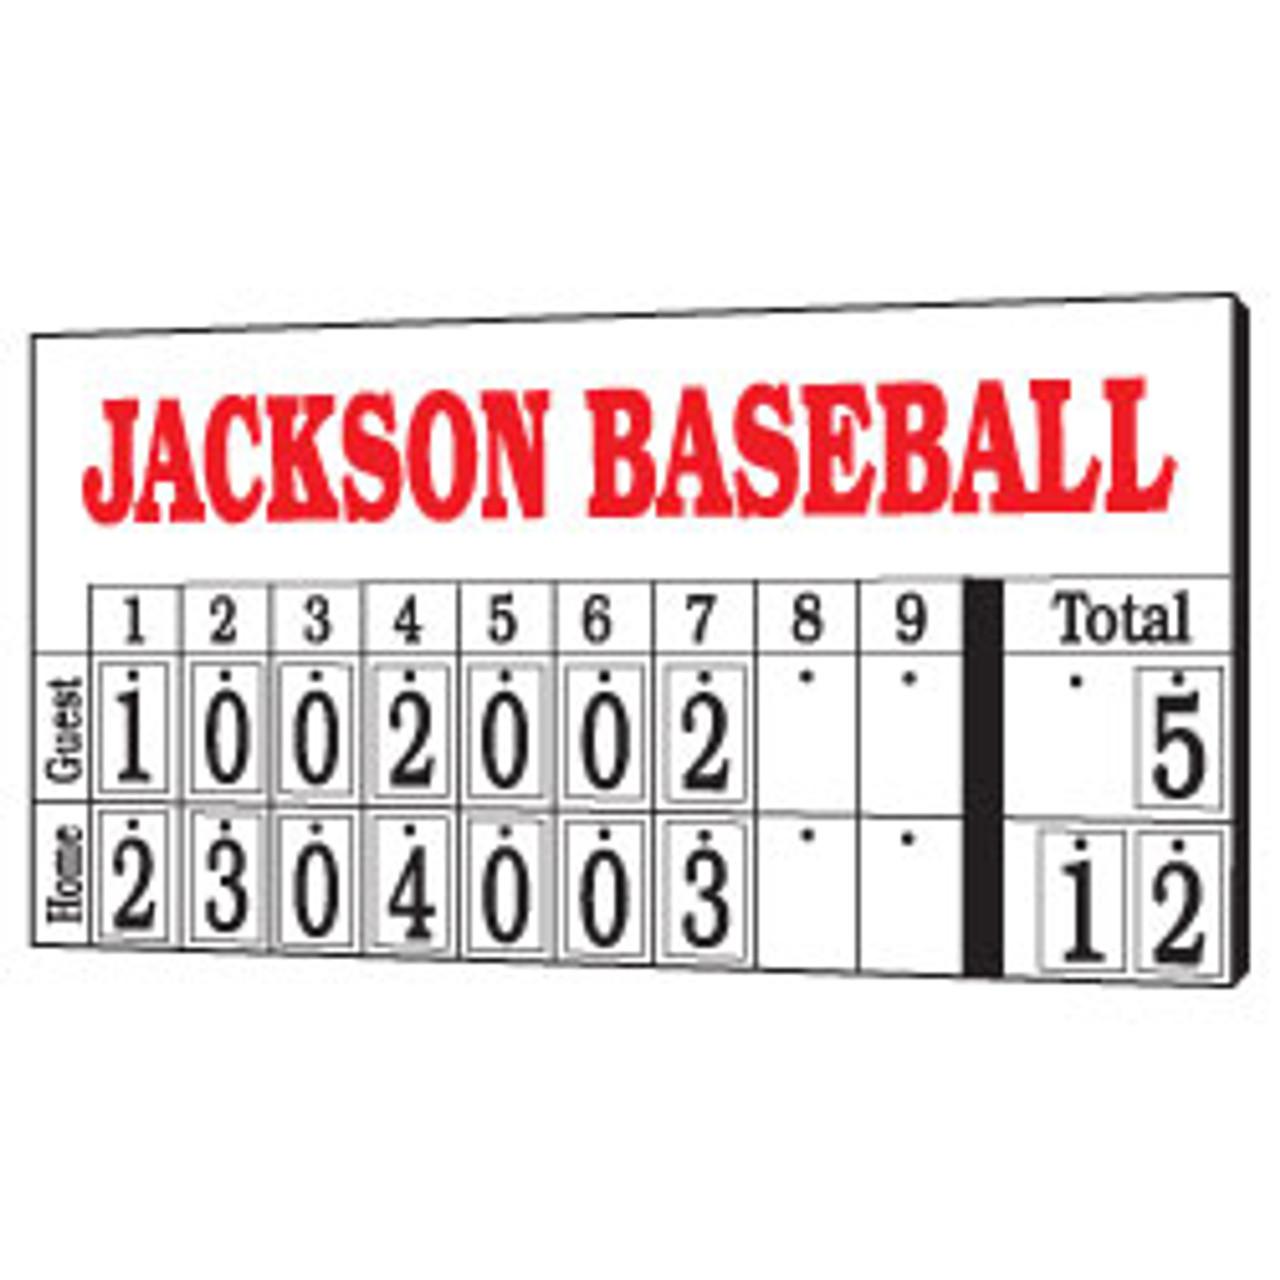 8' x 4' Hanging Numbers Baseball Scoreboard